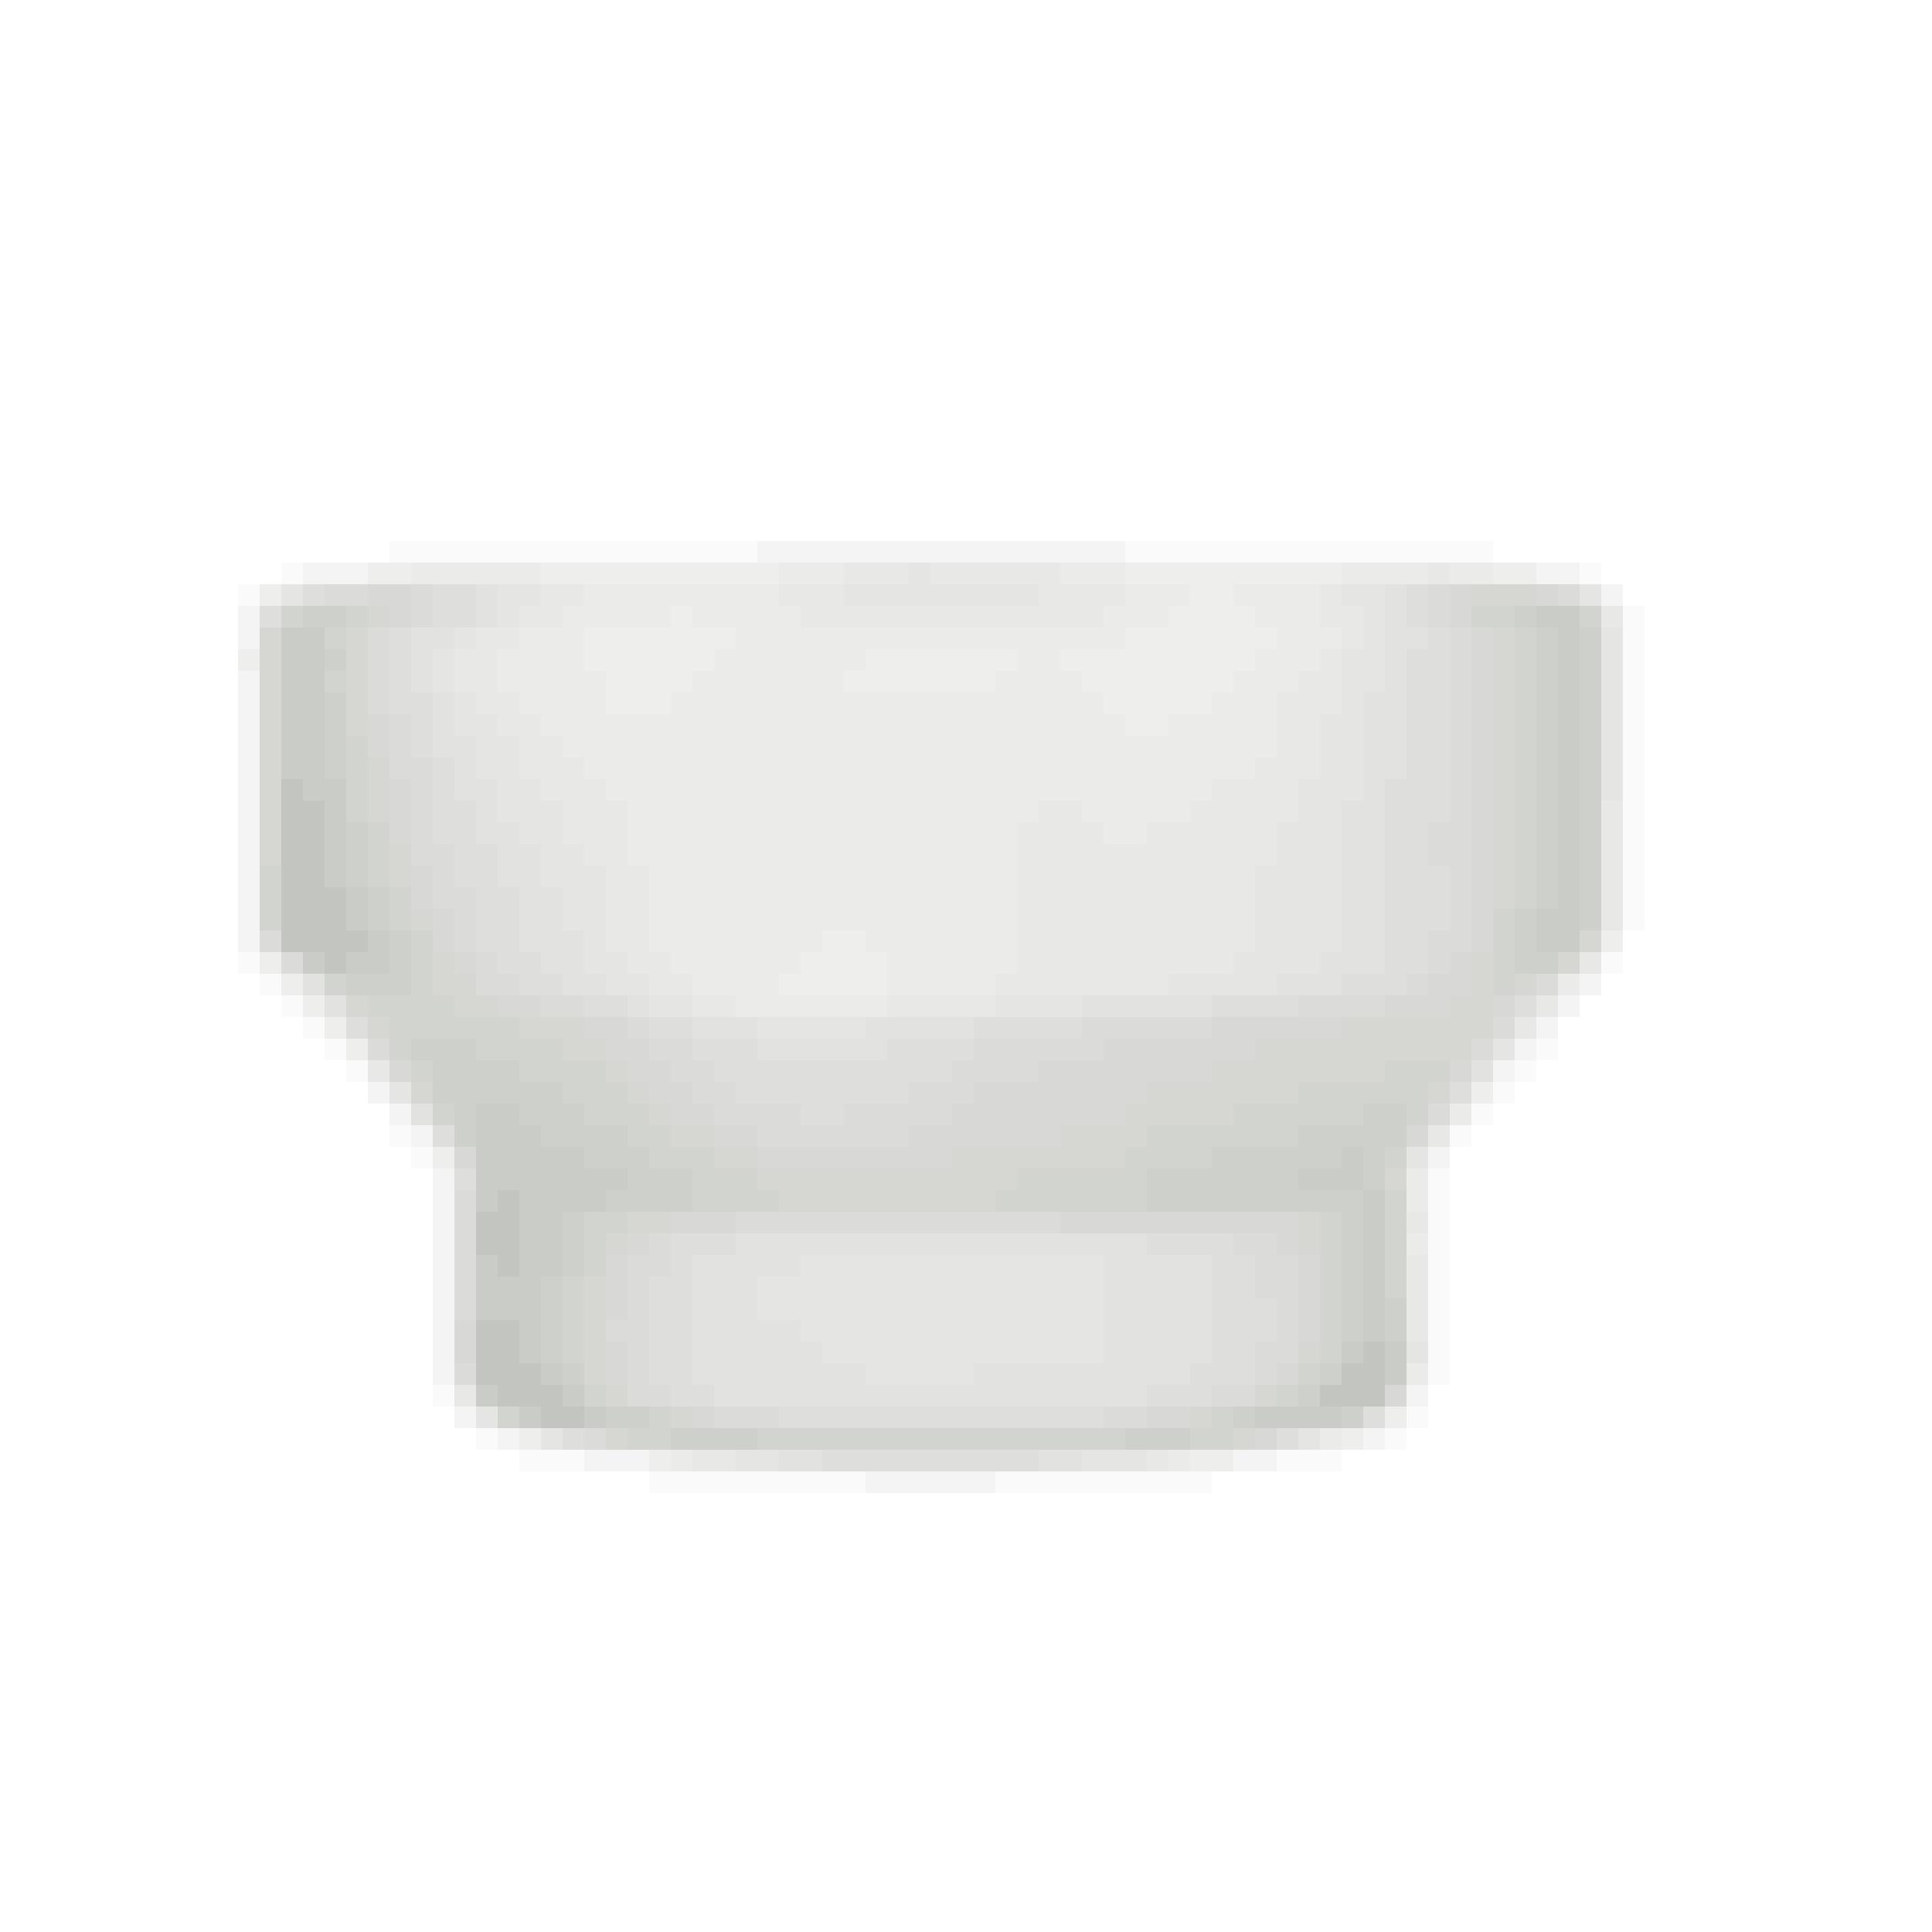 Meta skål, skål i aluminium. Ø 24 cm, 549 kr. (Normann Copenhagen). Få den fx her!